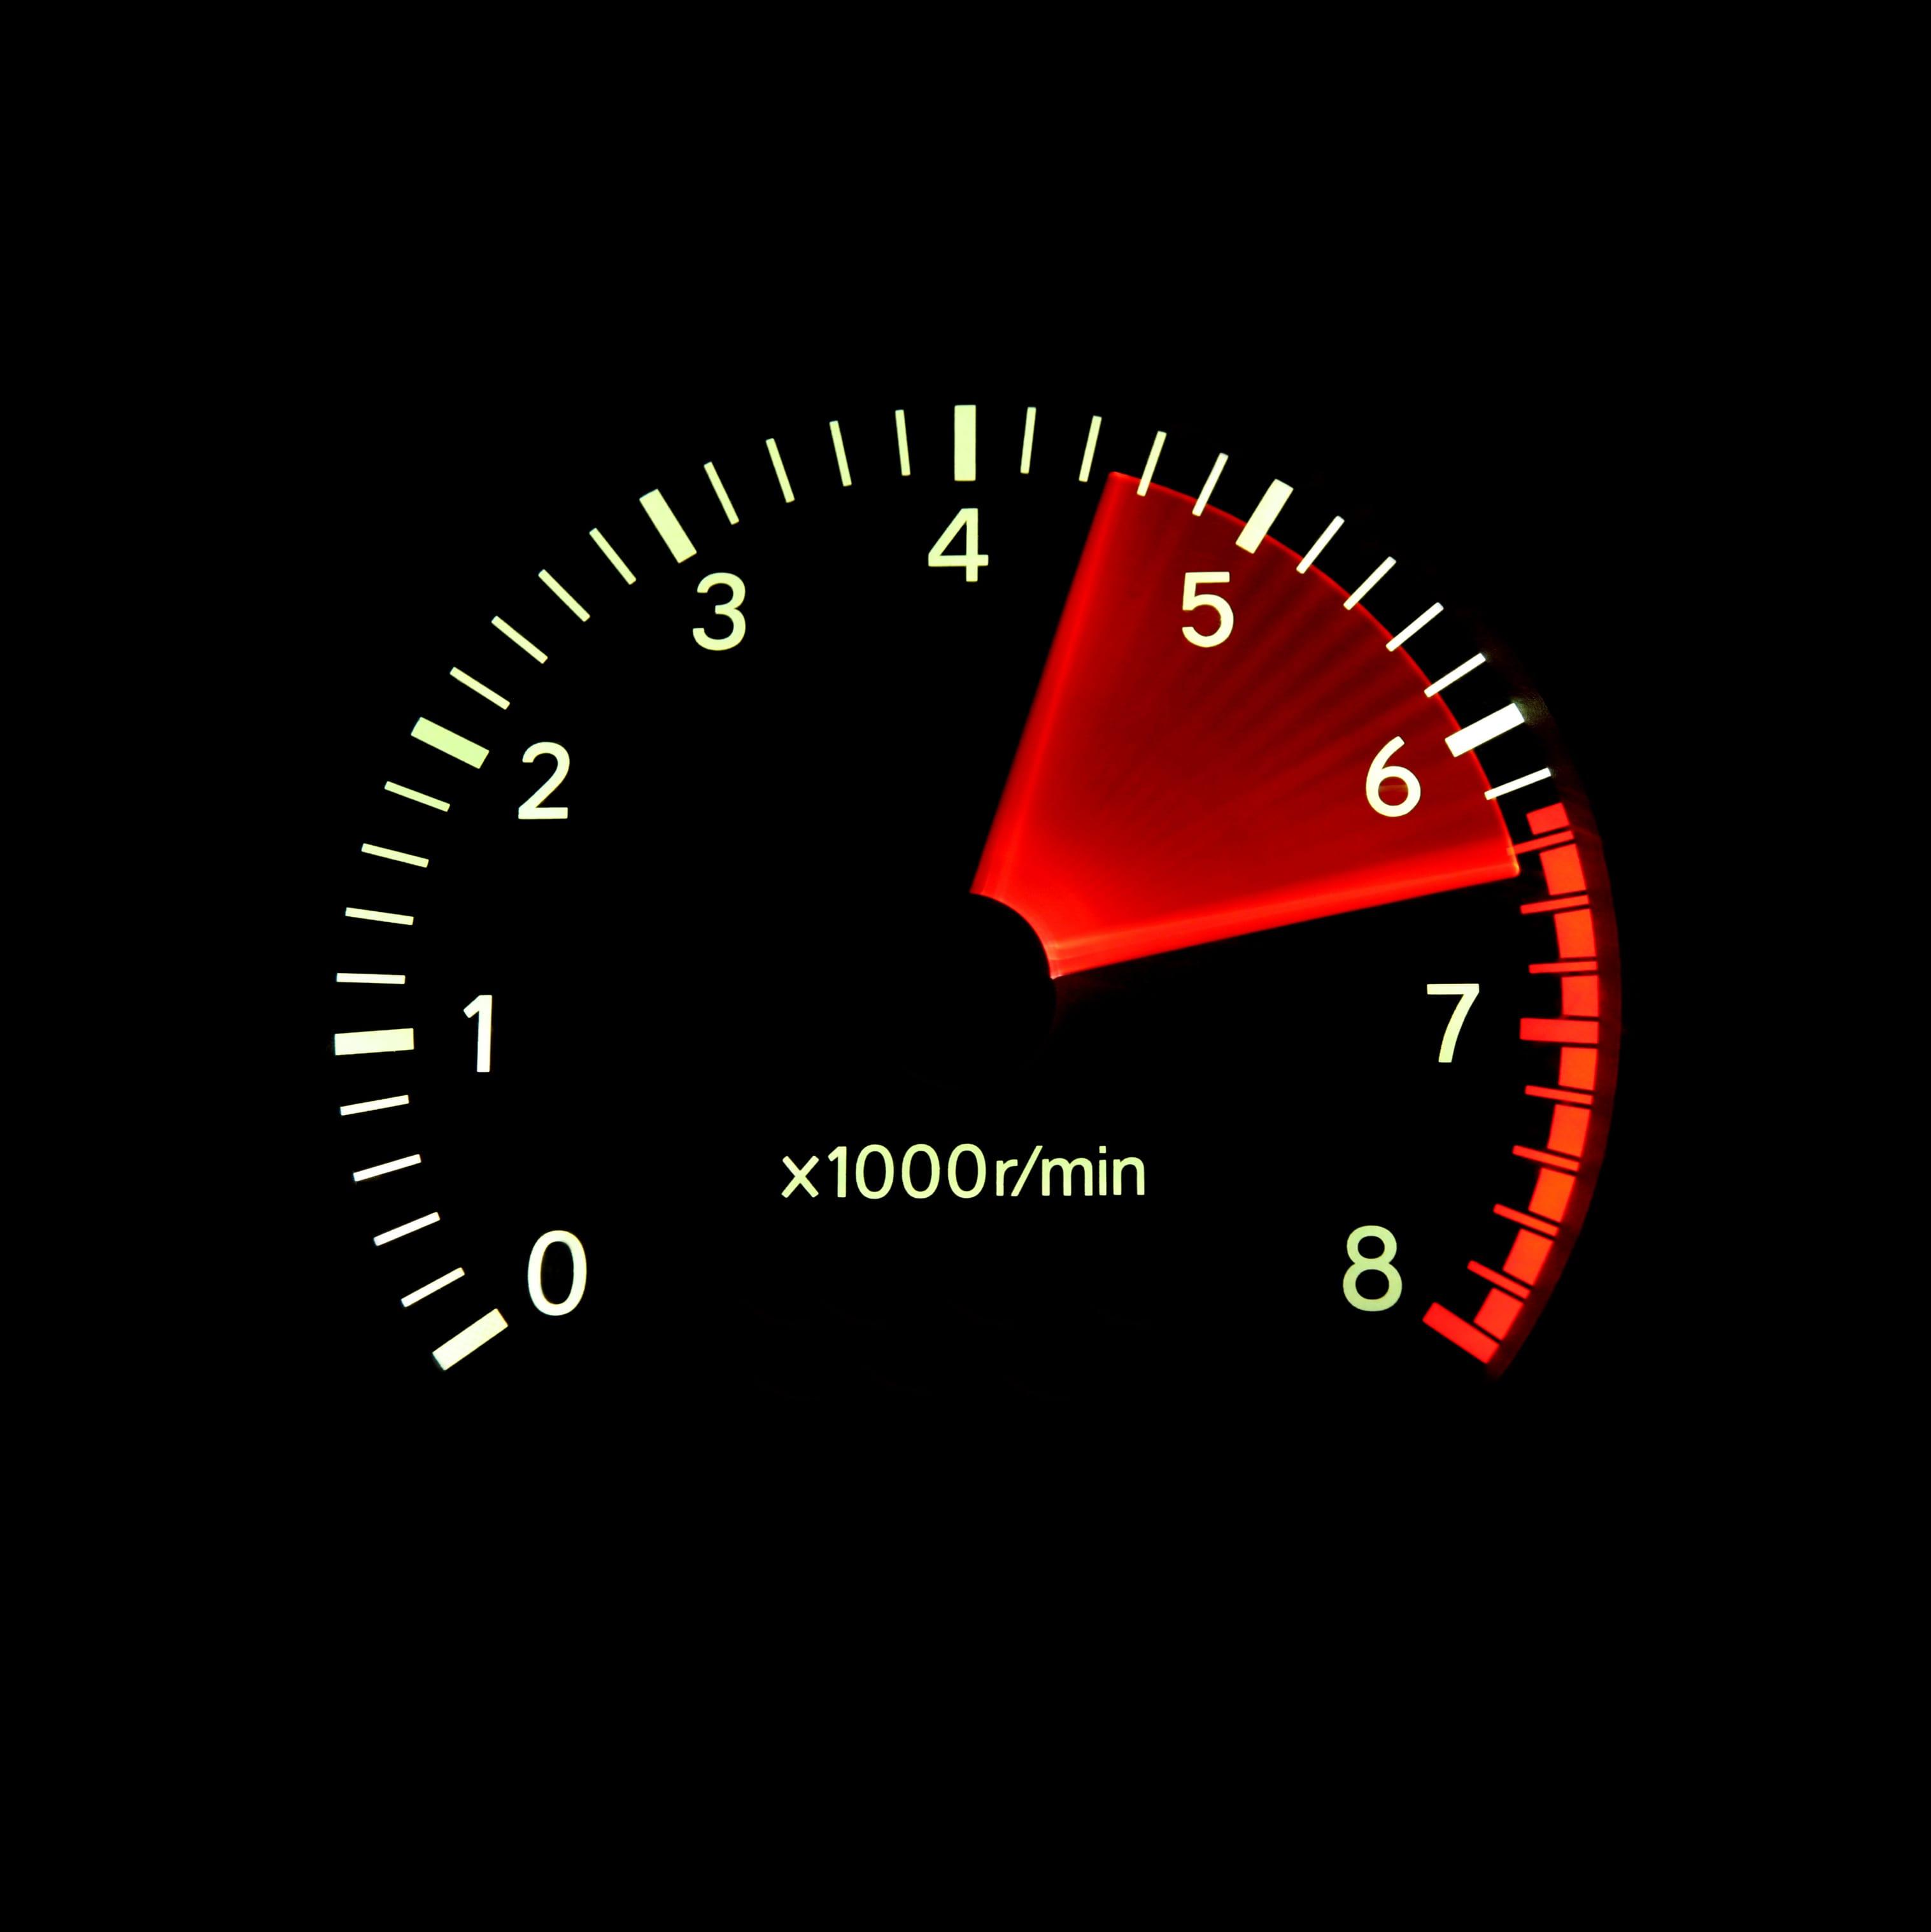 US Dealer Red Zone Speedometer